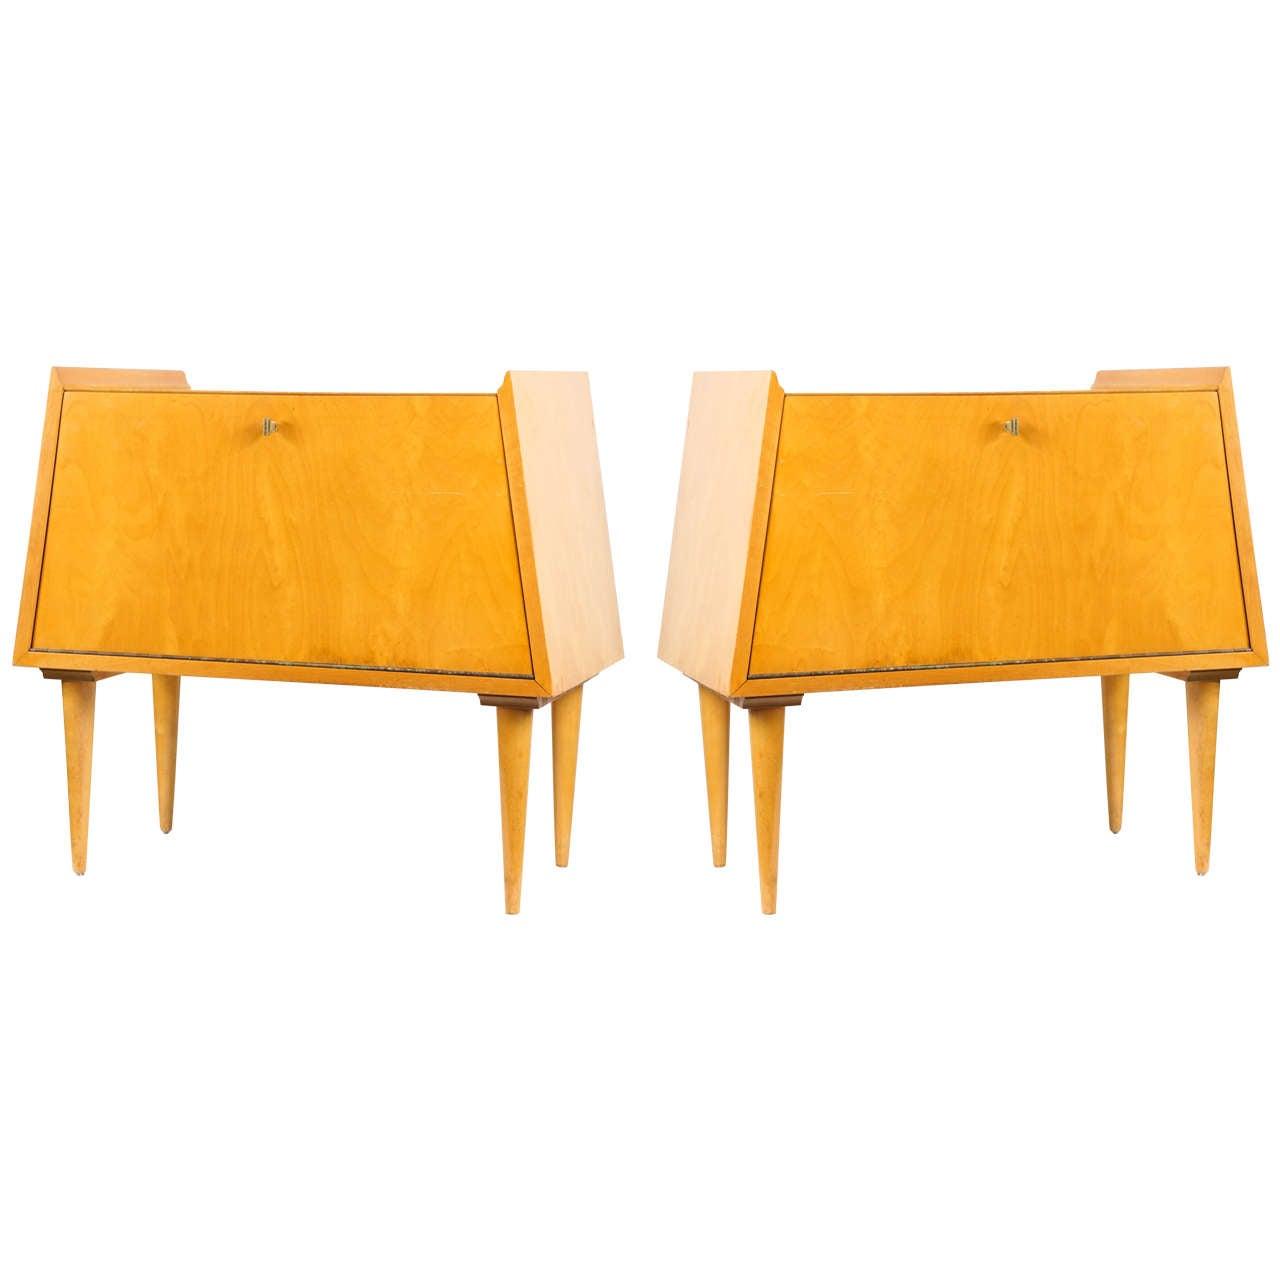 Pair of Edmund Spence Bedside Tables